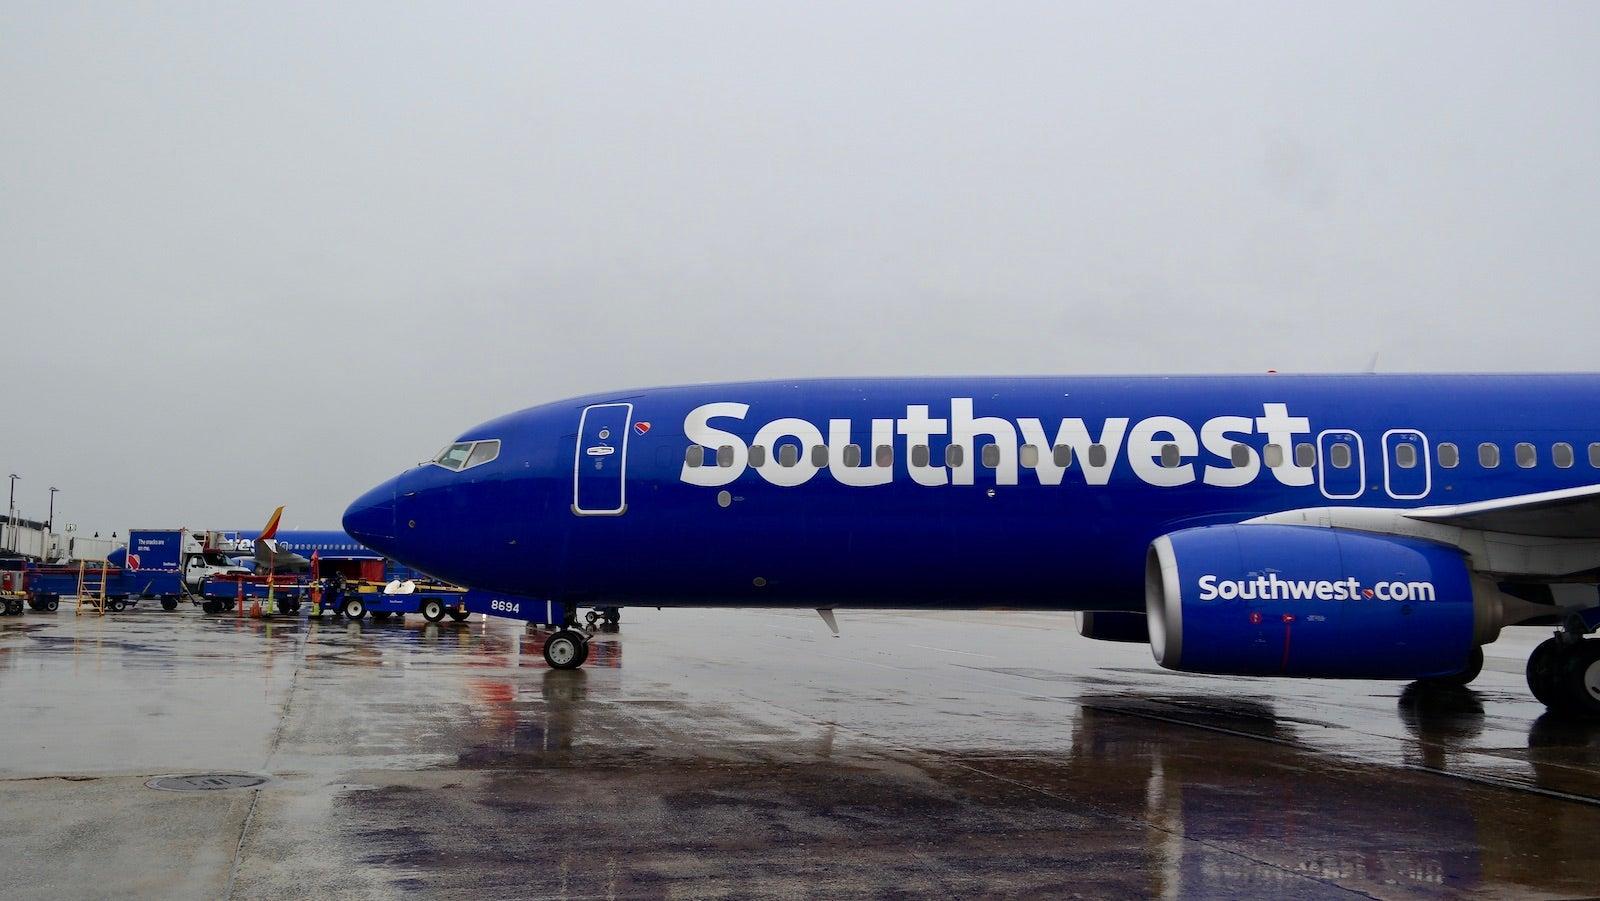 Southwest 737 pulling into gate